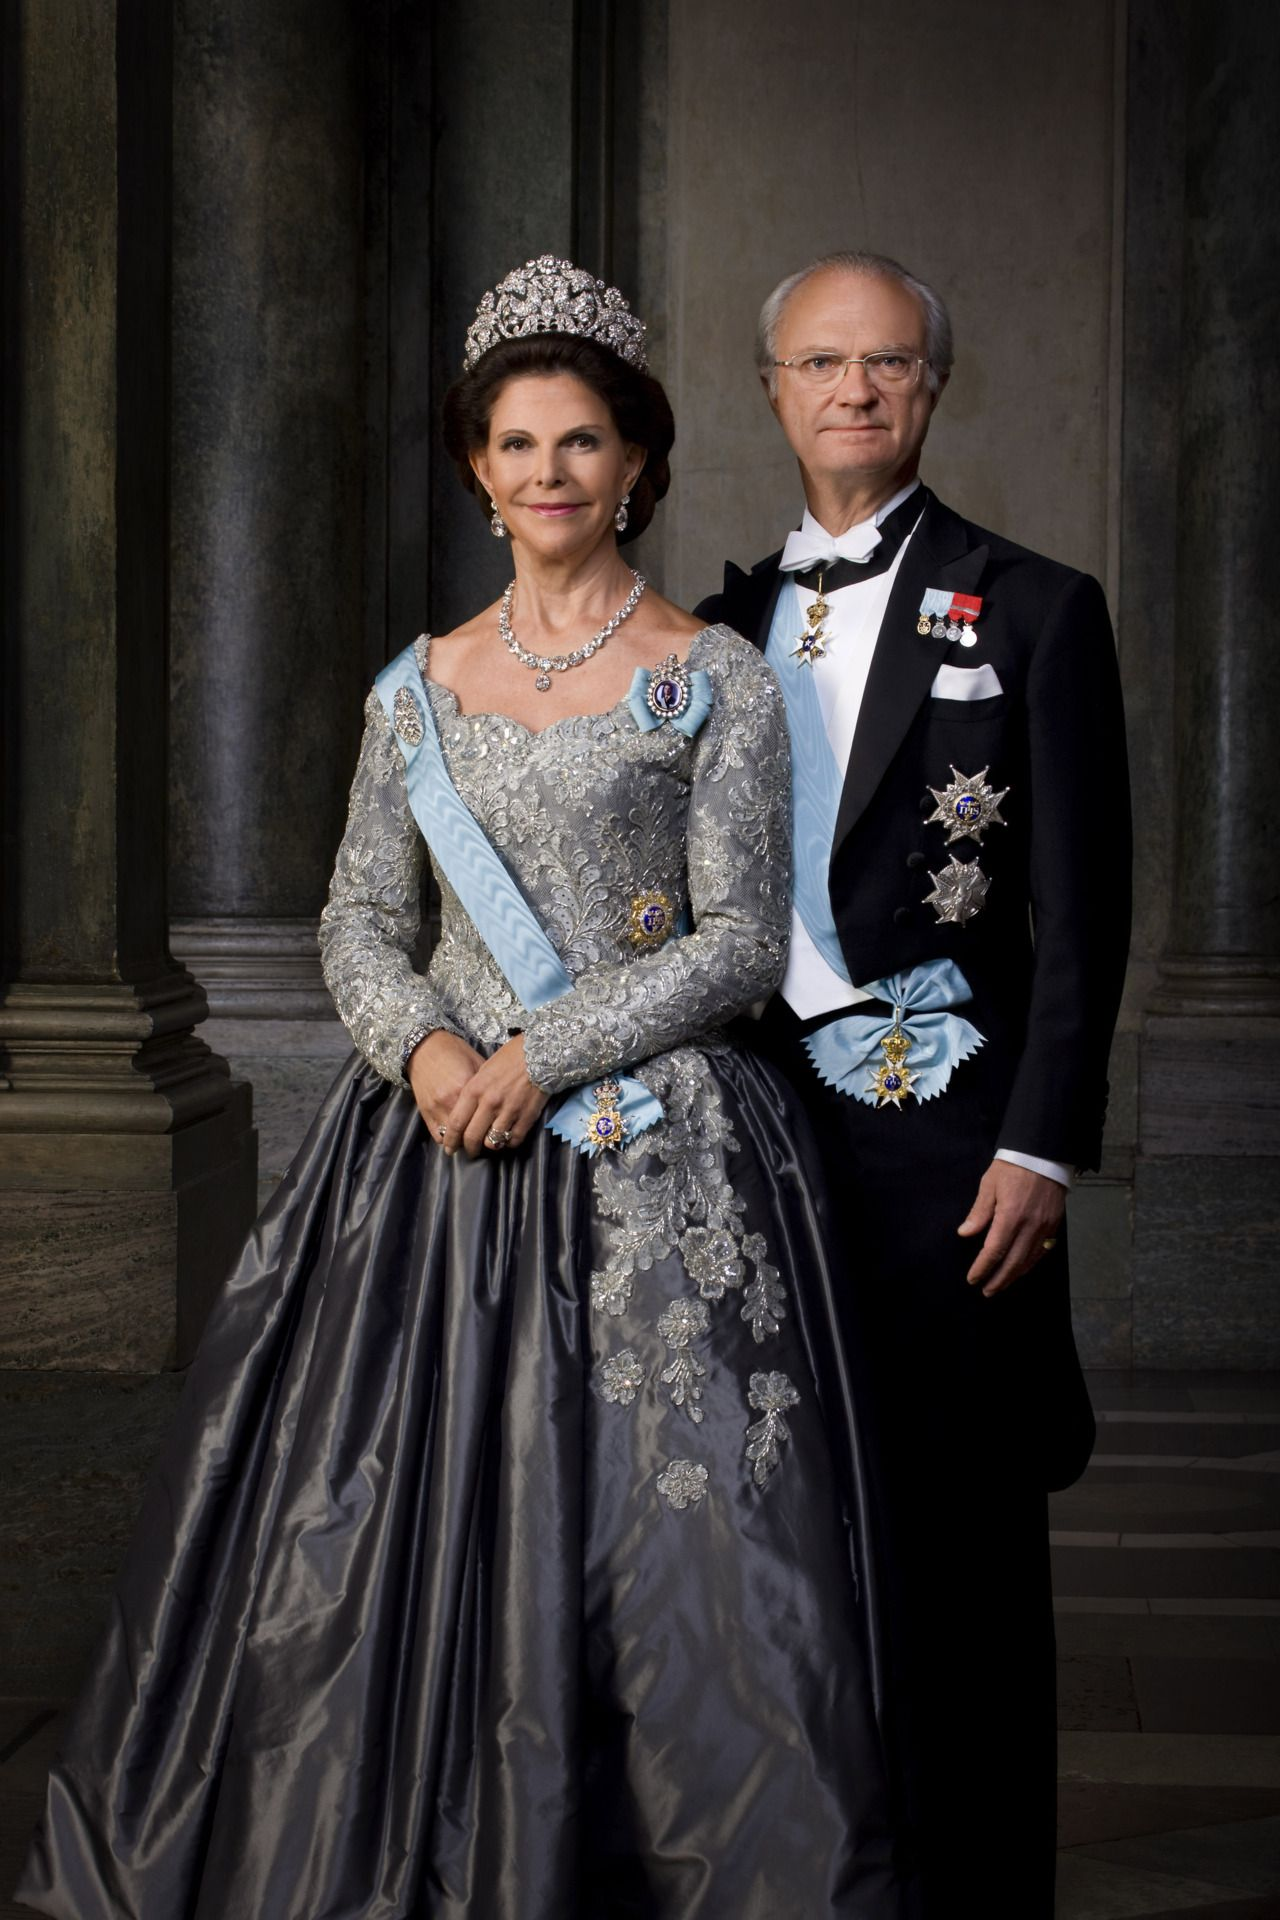 king carl xvi gustaf queen silvia of sweden tiara. Black Bedroom Furniture Sets. Home Design Ideas